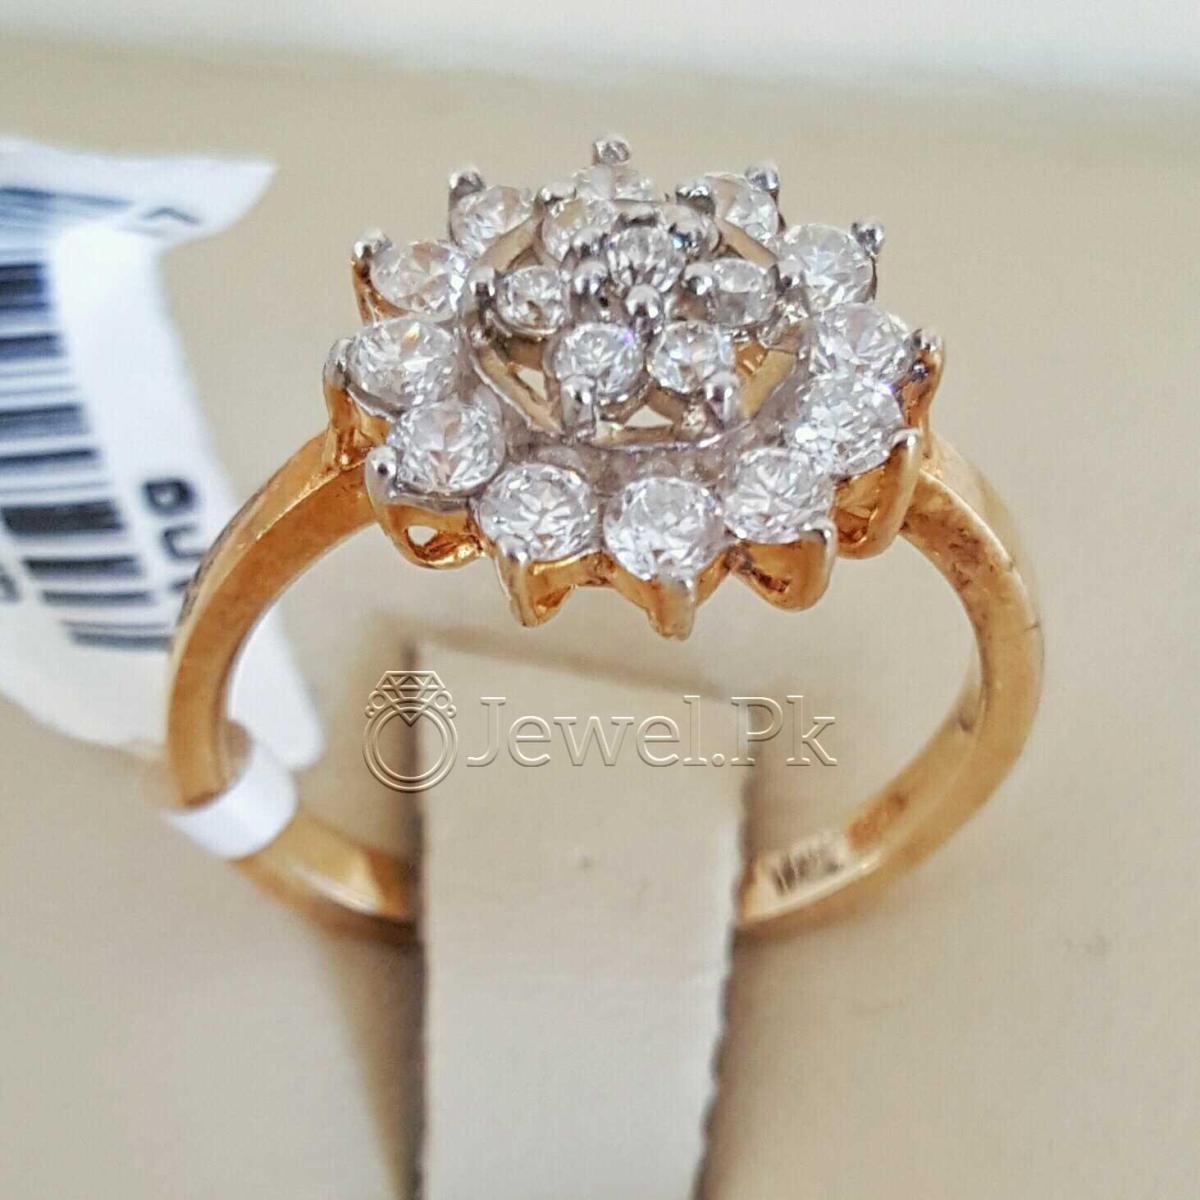 925 Silver Luxury Rings for Ladies Women Silver Rings Woman Handmade Rings 26 natural gemstones pakistan + 925 silver jewelry online